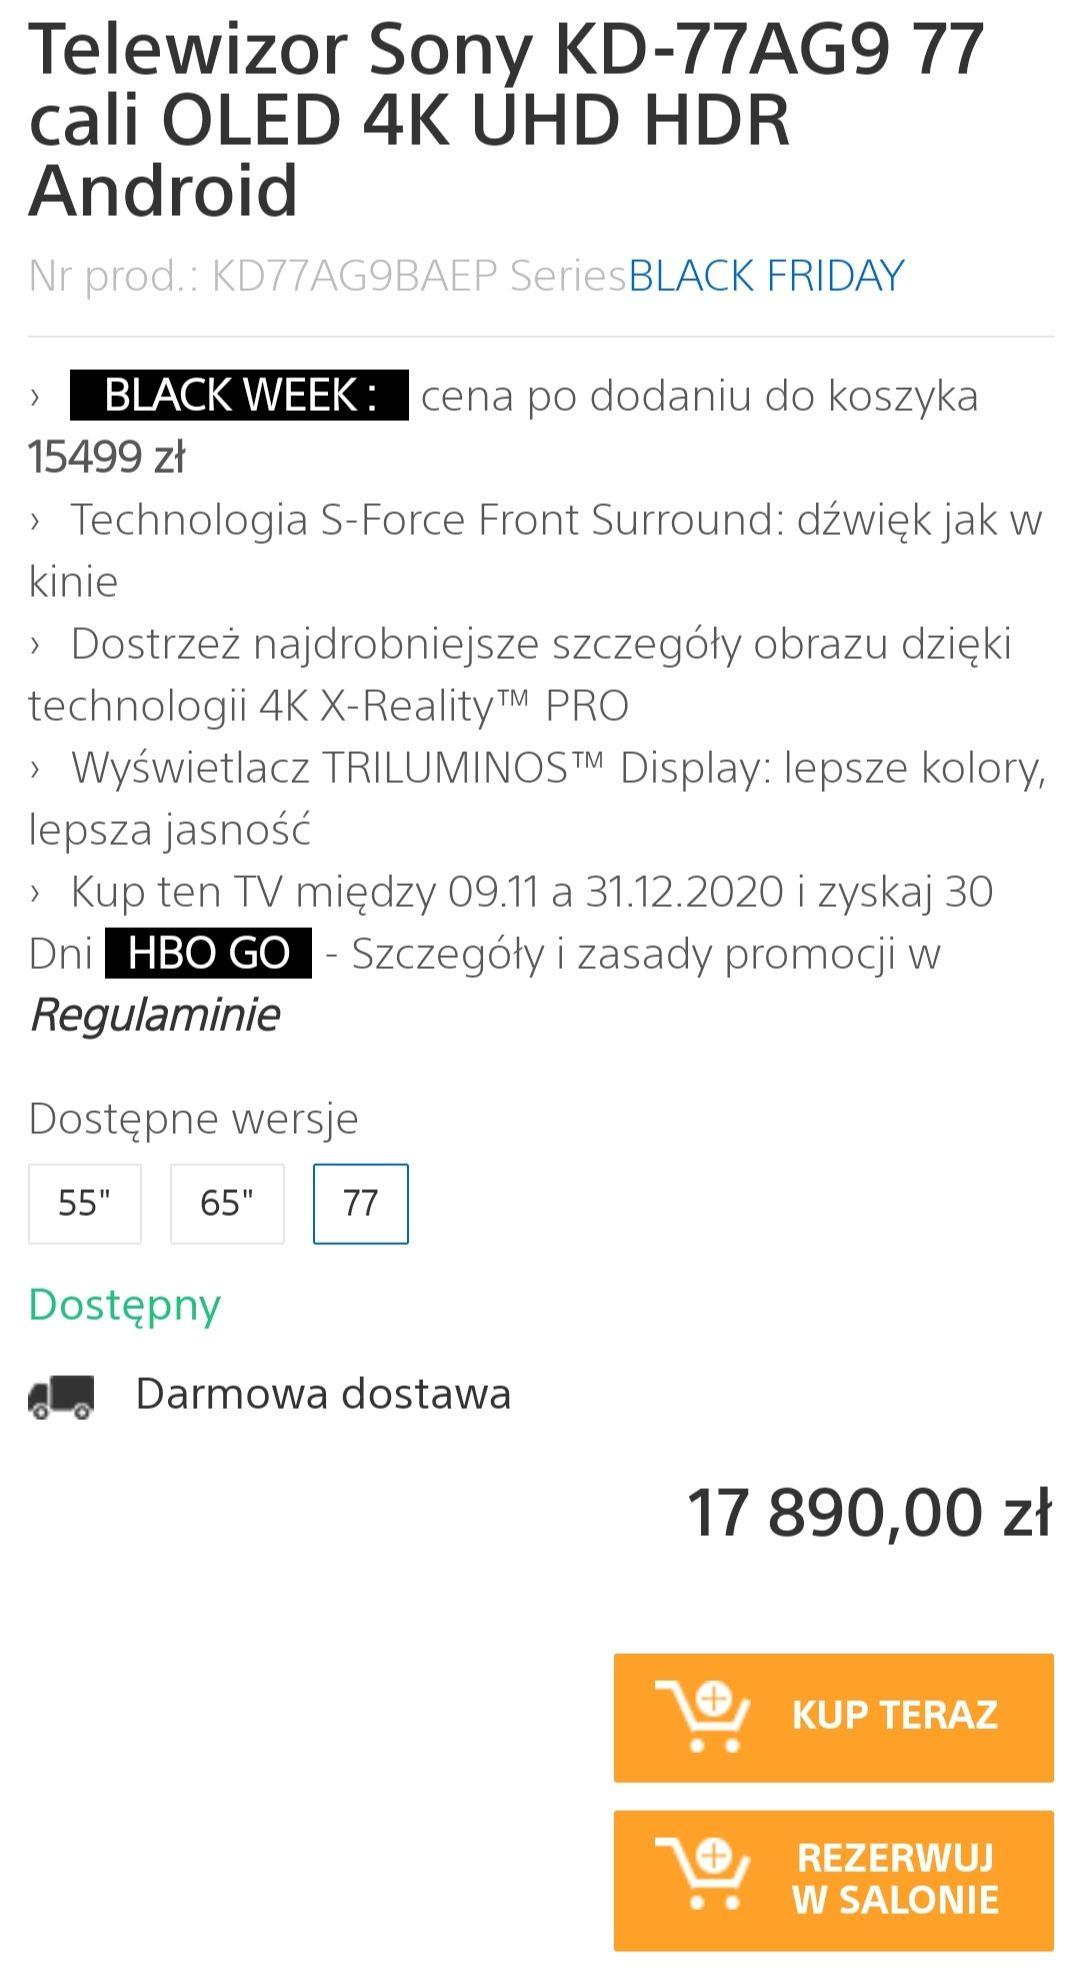 Telewizor Sony KD-77AG9 77 cali OLED 4K UHD HDR Android